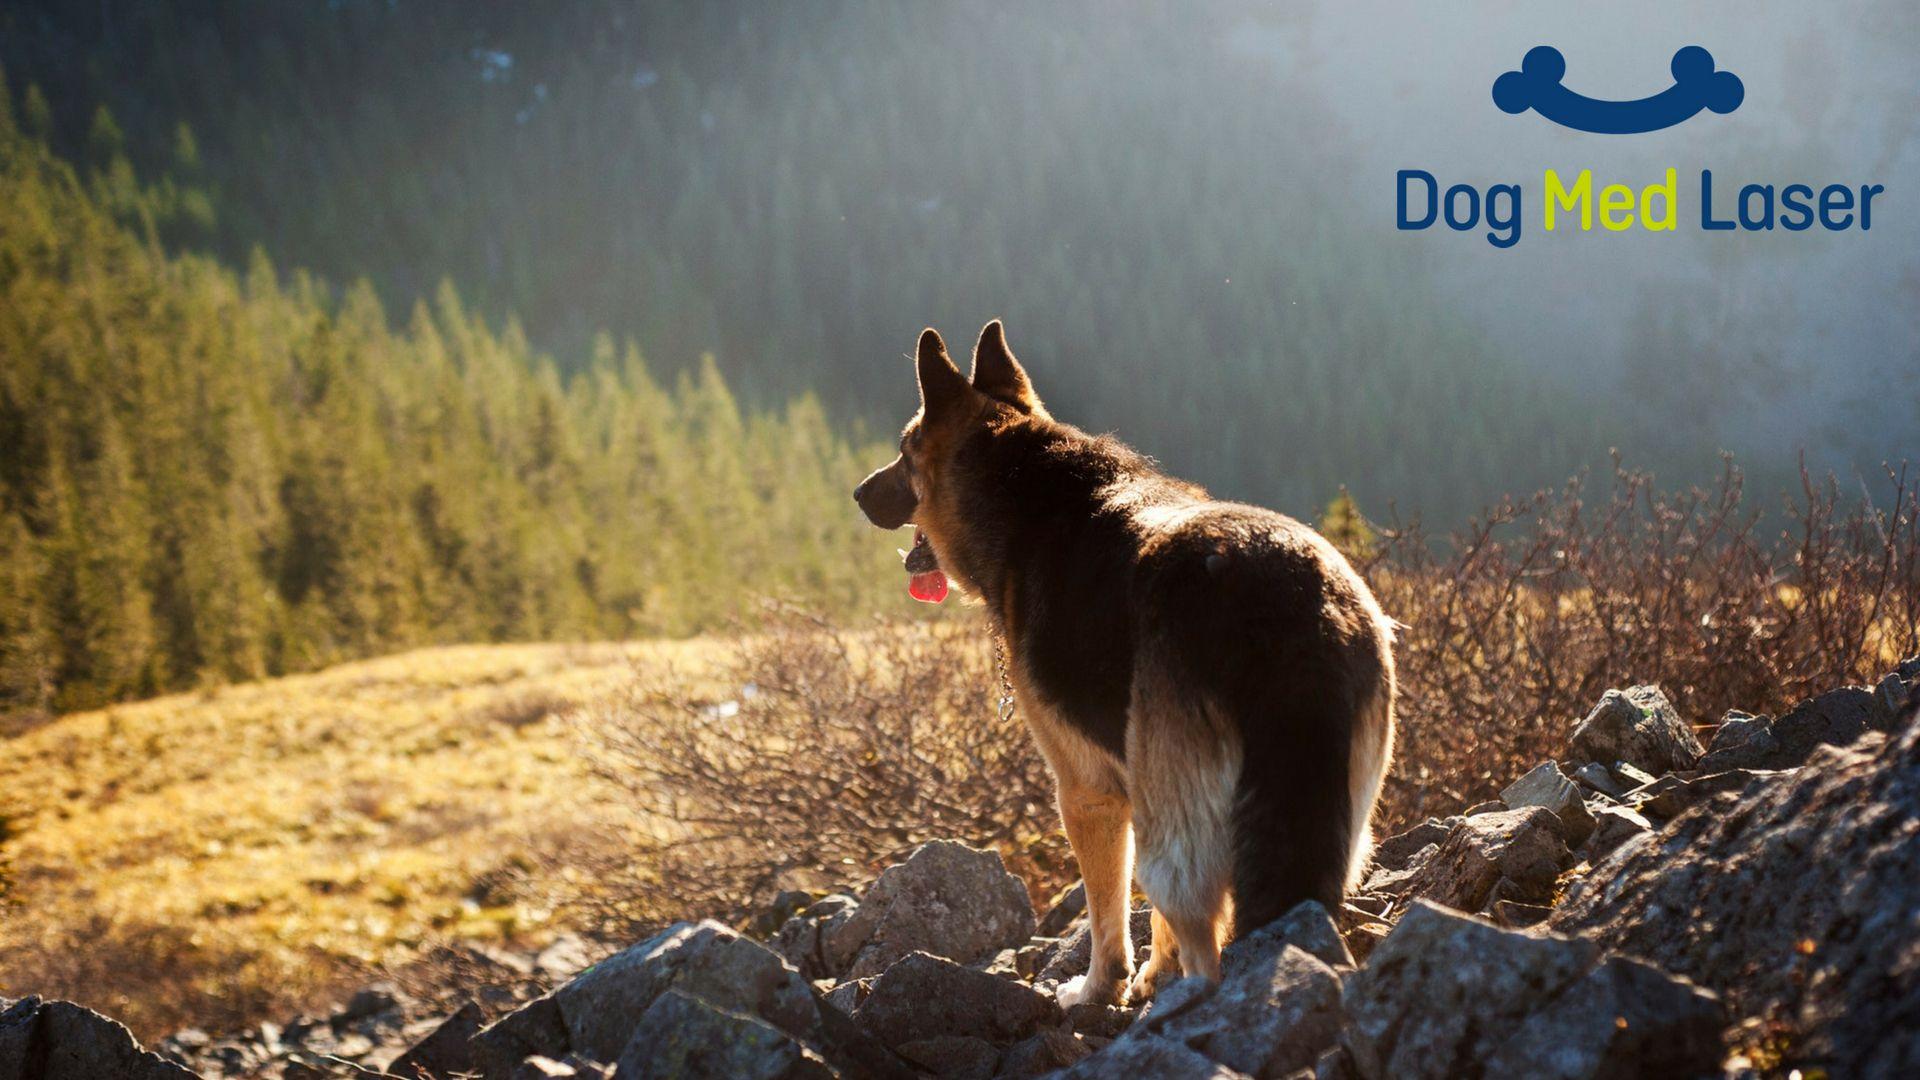 Home Giant Dog Breeds Meds For Dogs Giant Dogs